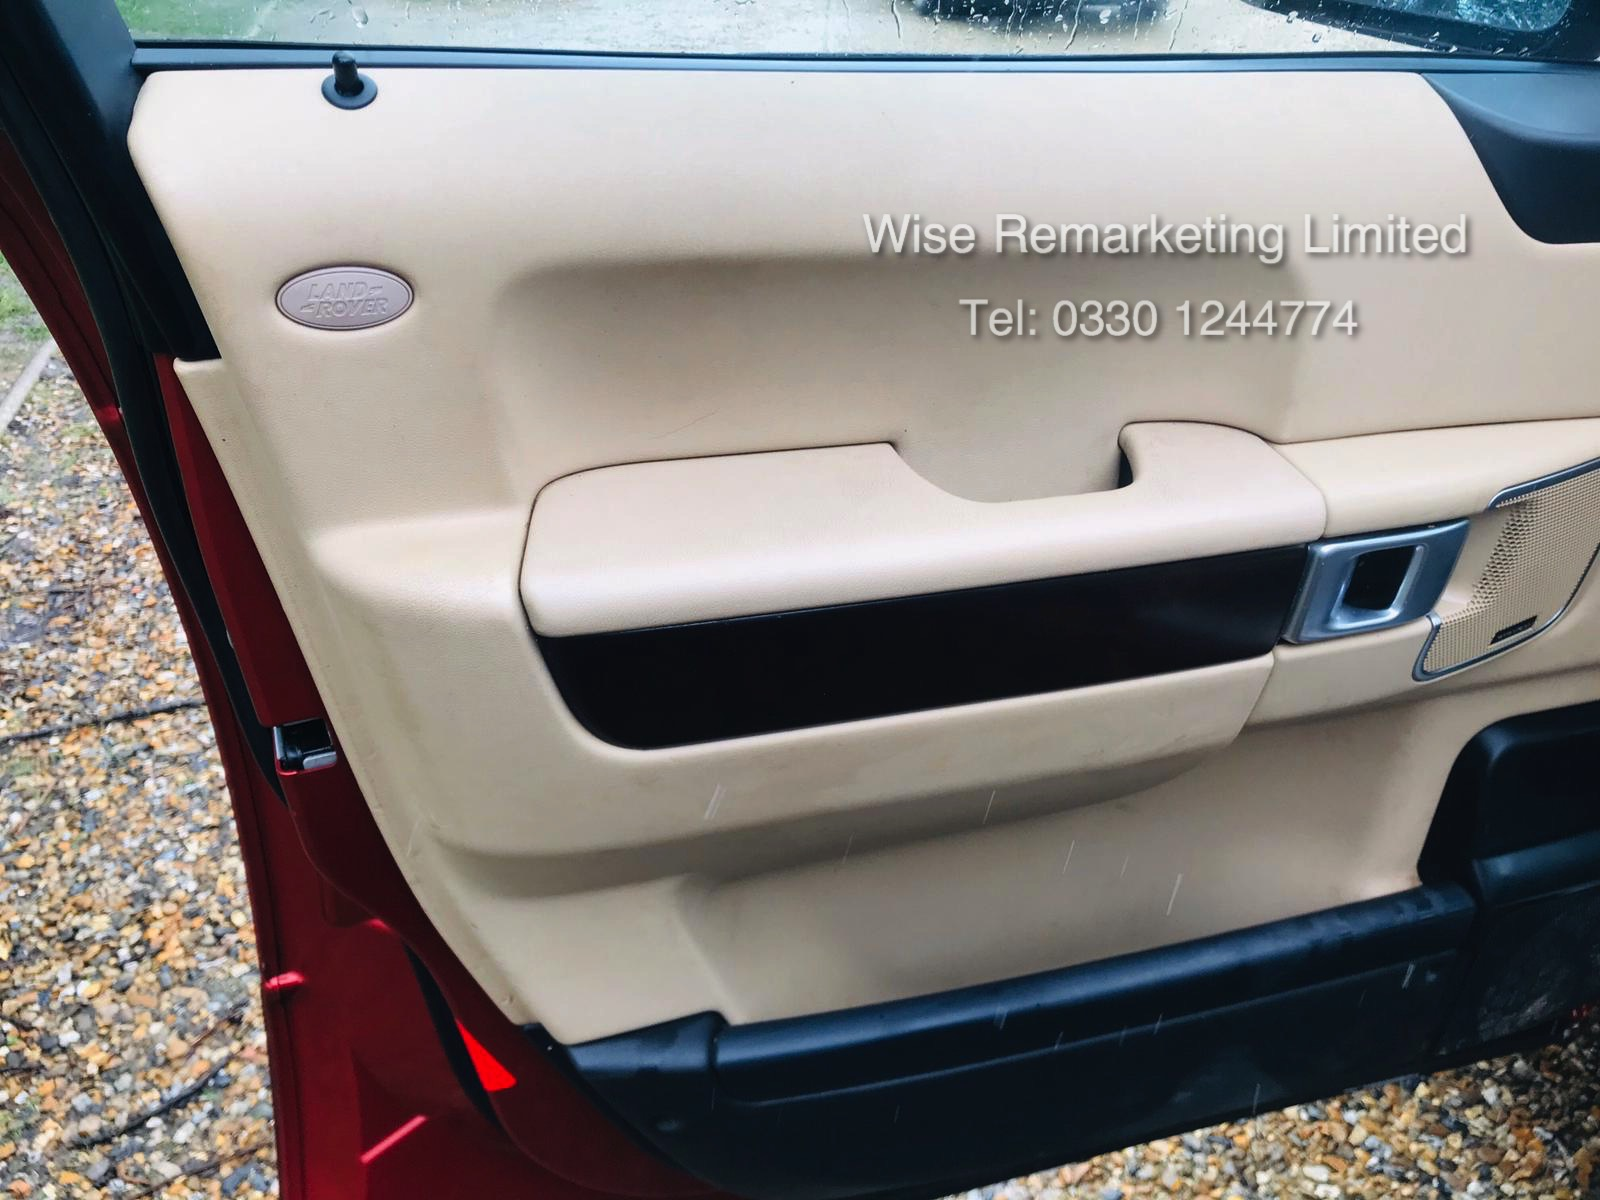 Range Rover Vogue 3.6 TDV8 HSE Auto - 2010 Model - Cream Leather - Service History - - Image 23 of 28